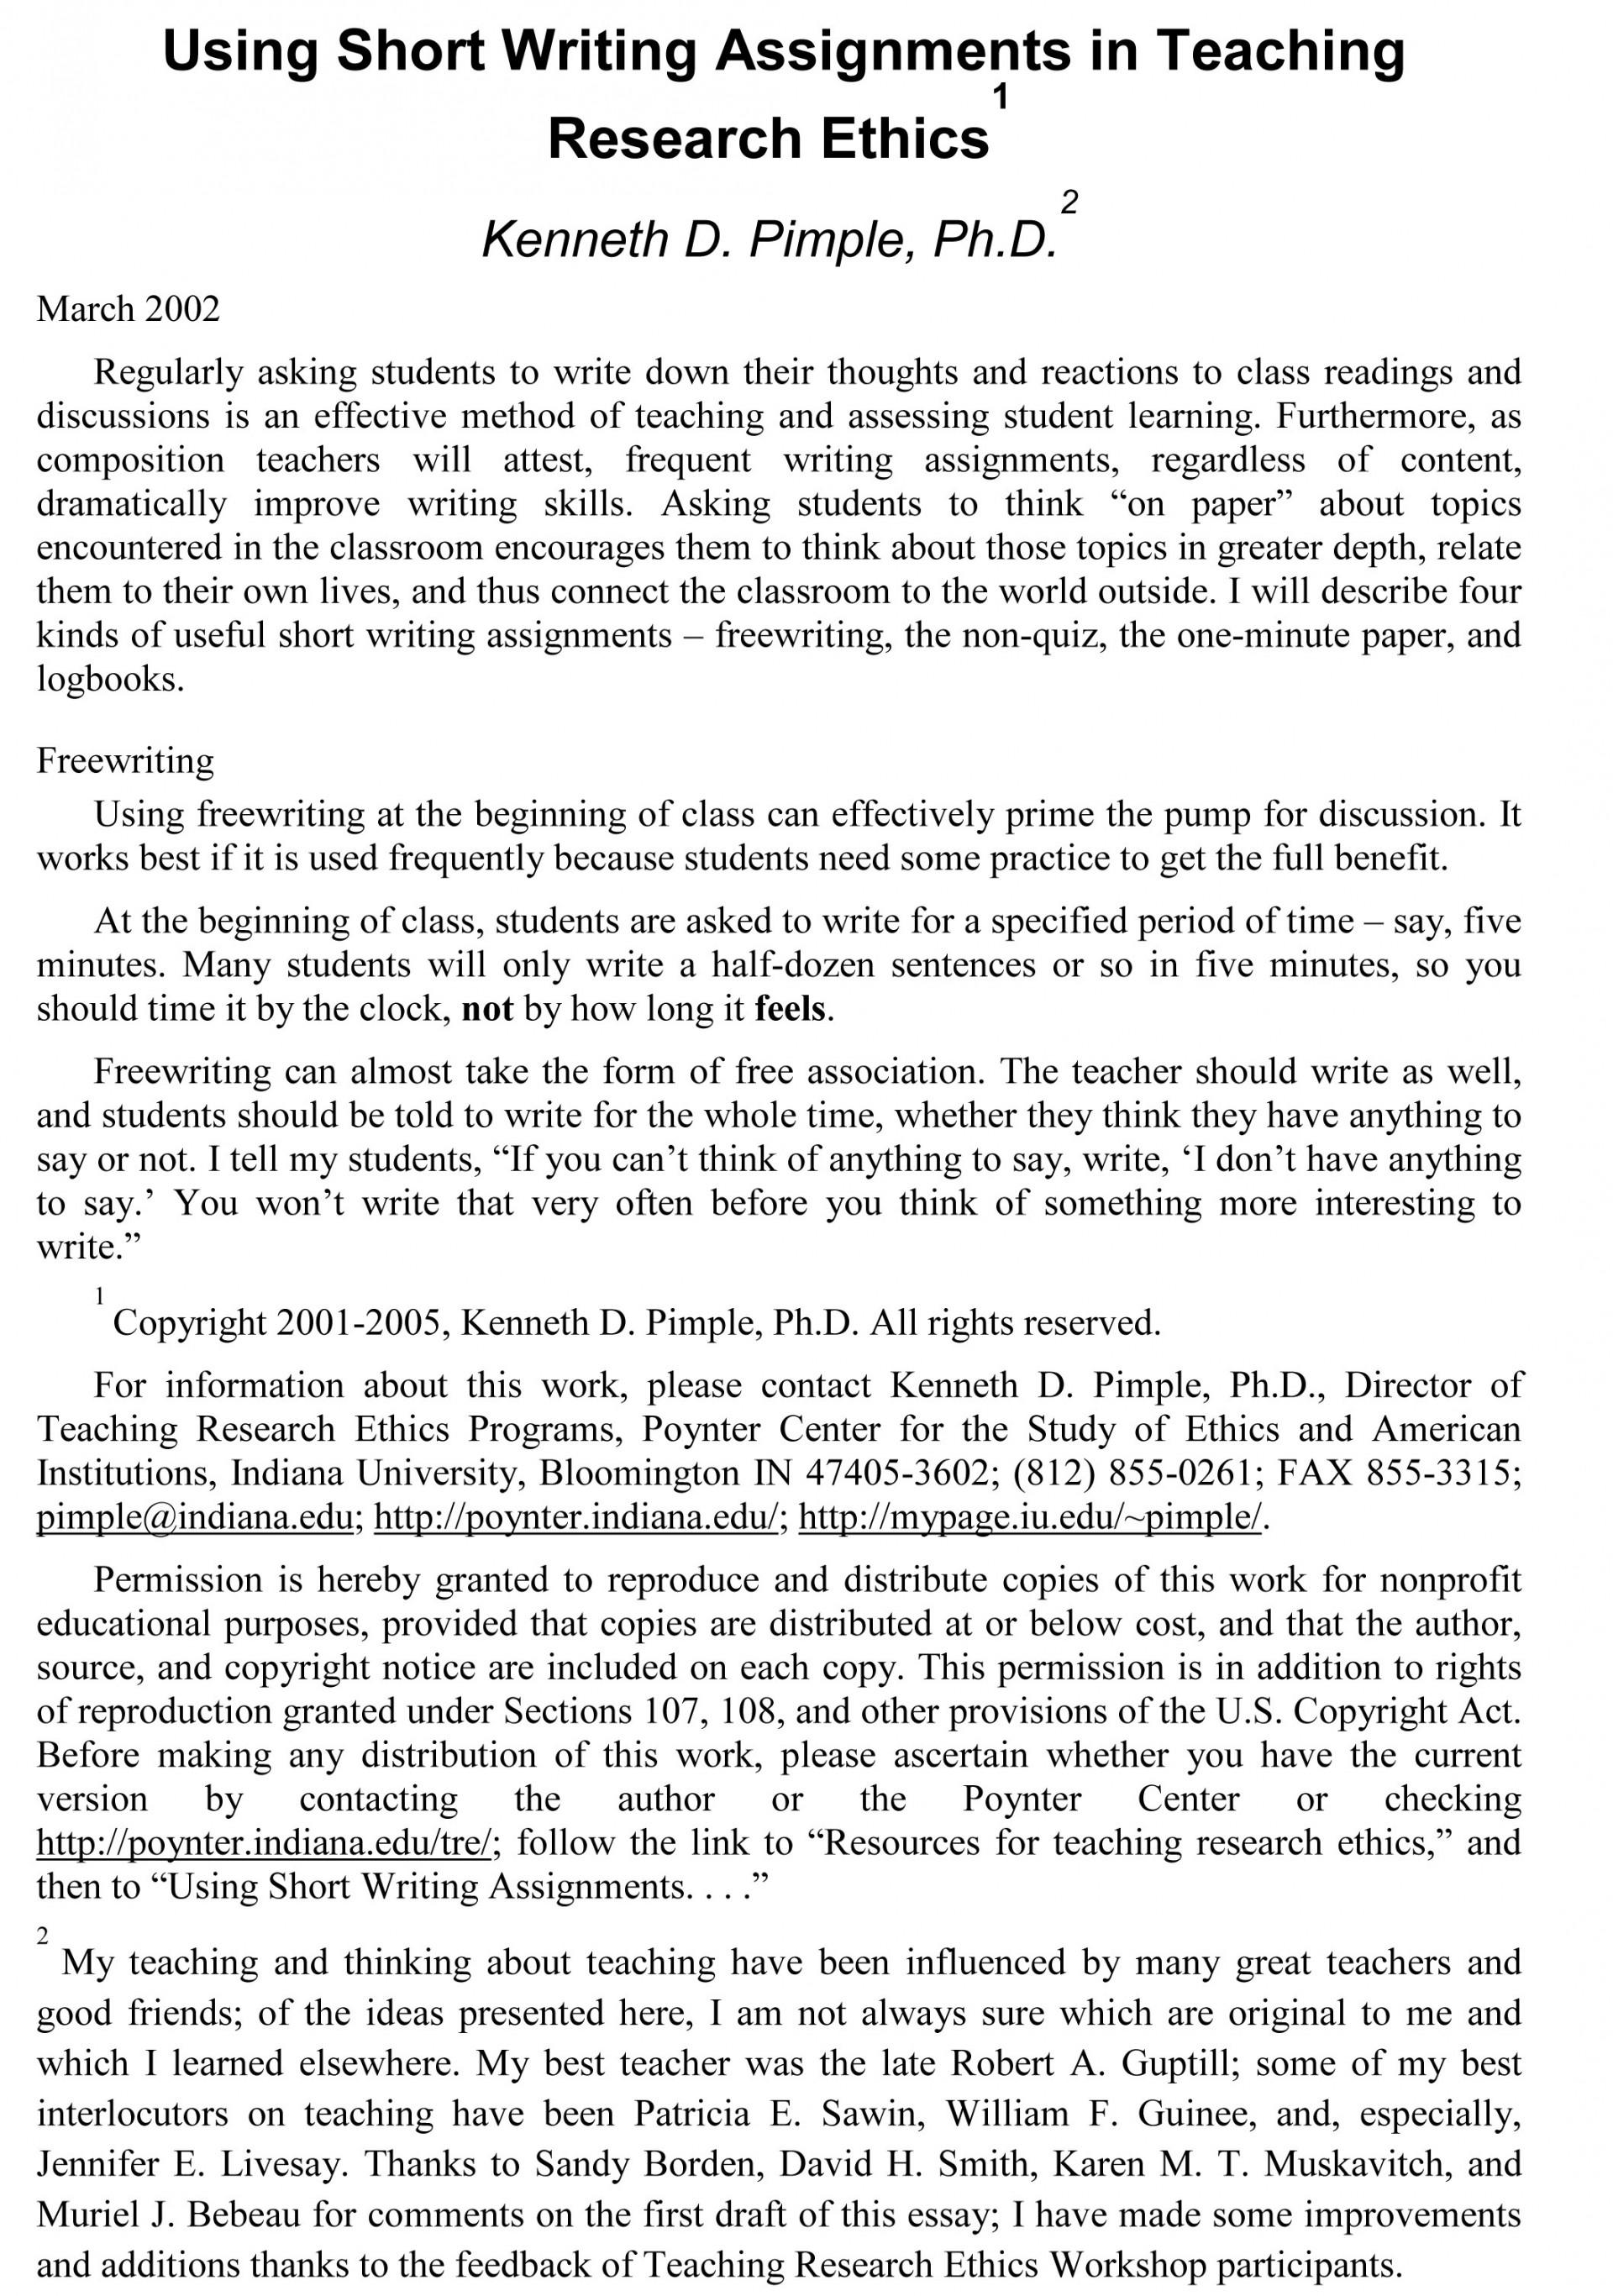 012 Essay Example Sample Teaching Remarkable Diversity Law School Uw Examples Medical 1920